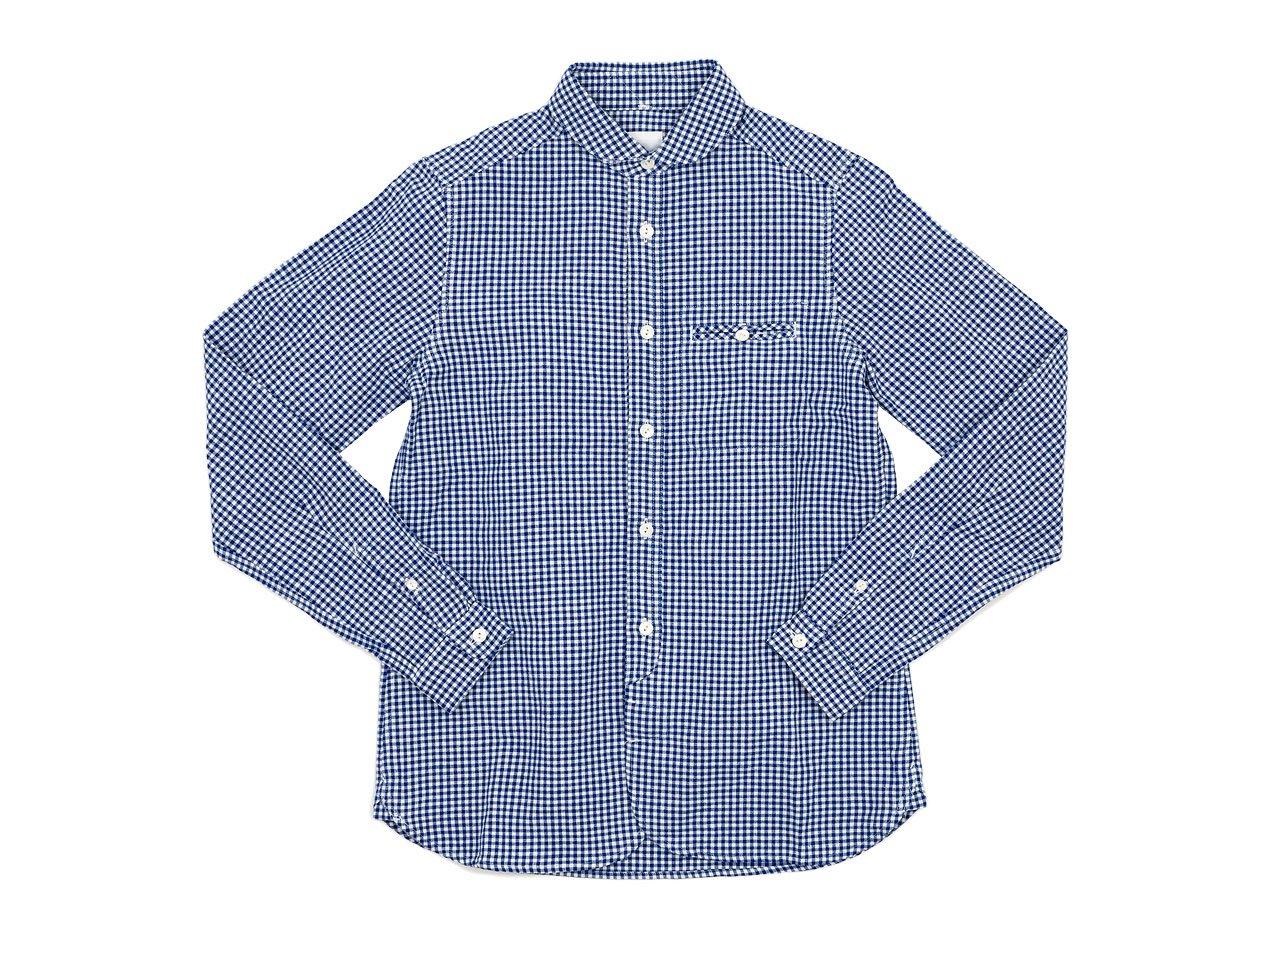 maillot sunset gingham round work shirts BLUE x WHITE